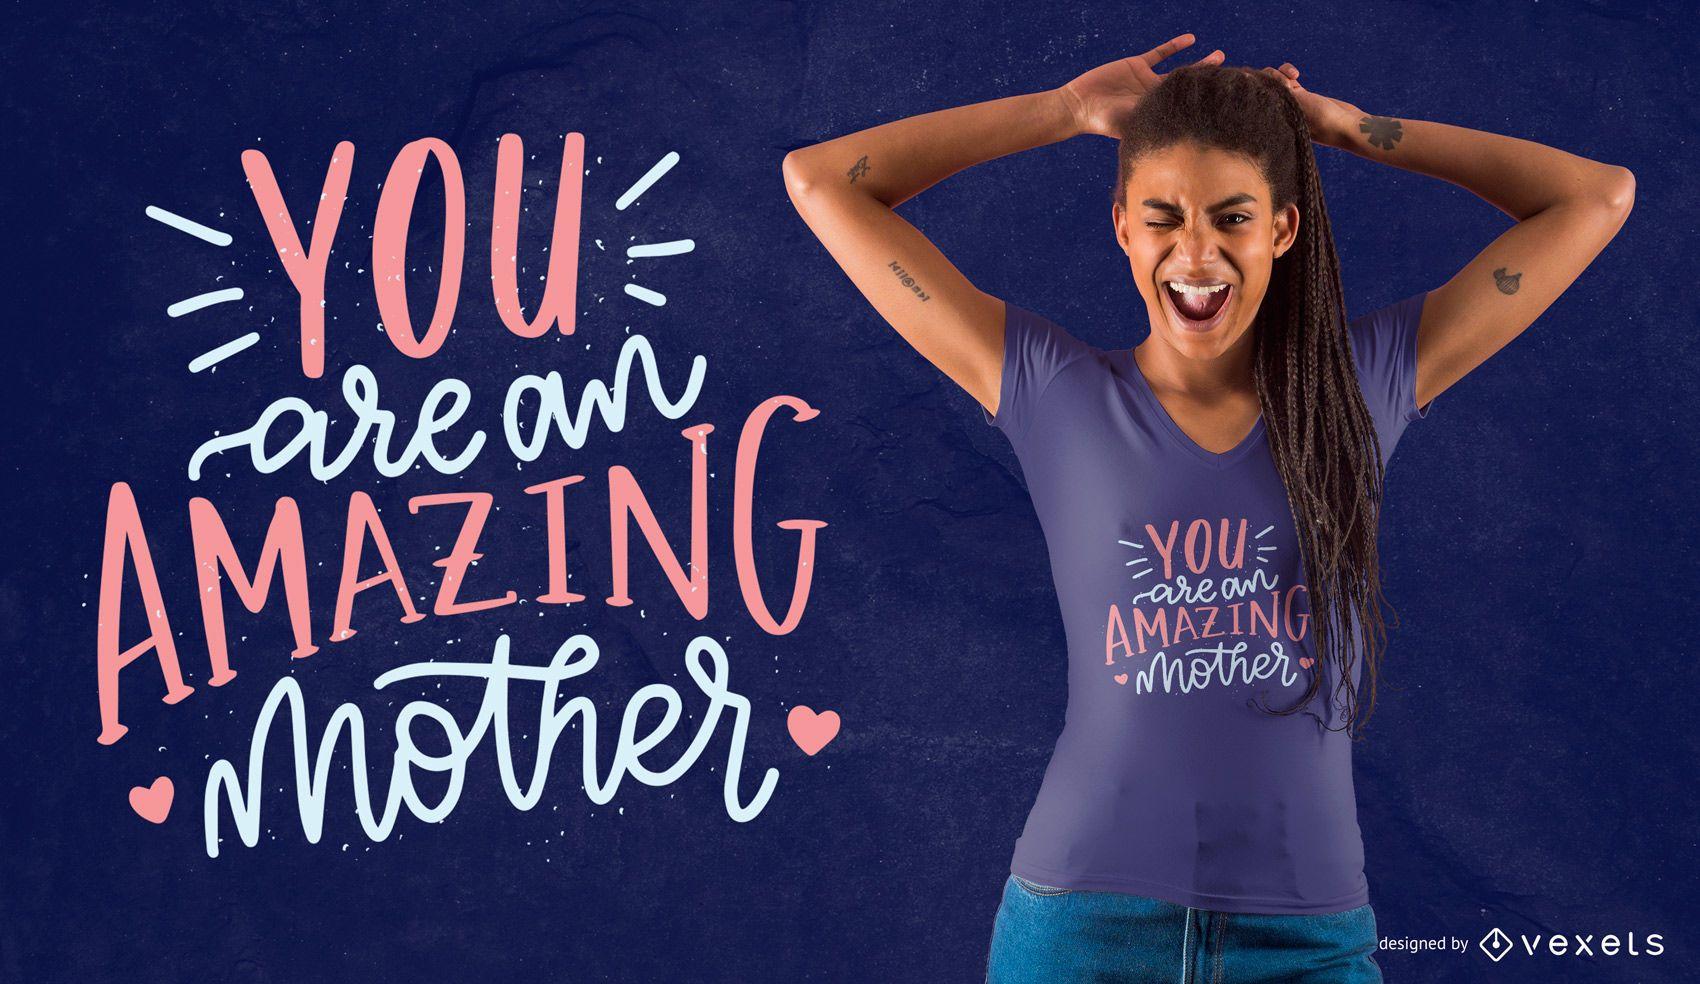 Amazing Mother T-shirt Design